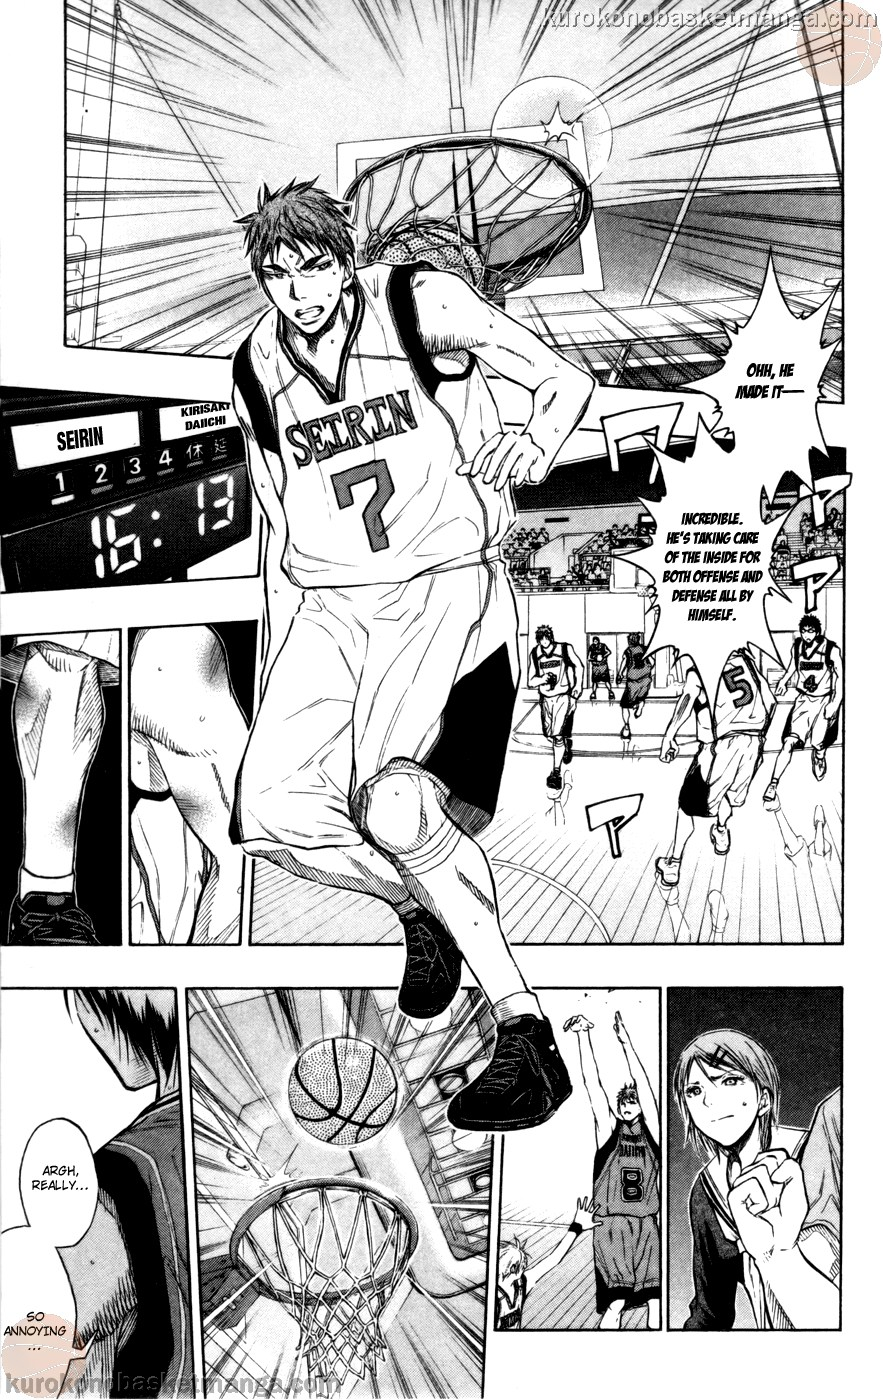 Kuroko no Basket Manga Chapter 102 - Image 13